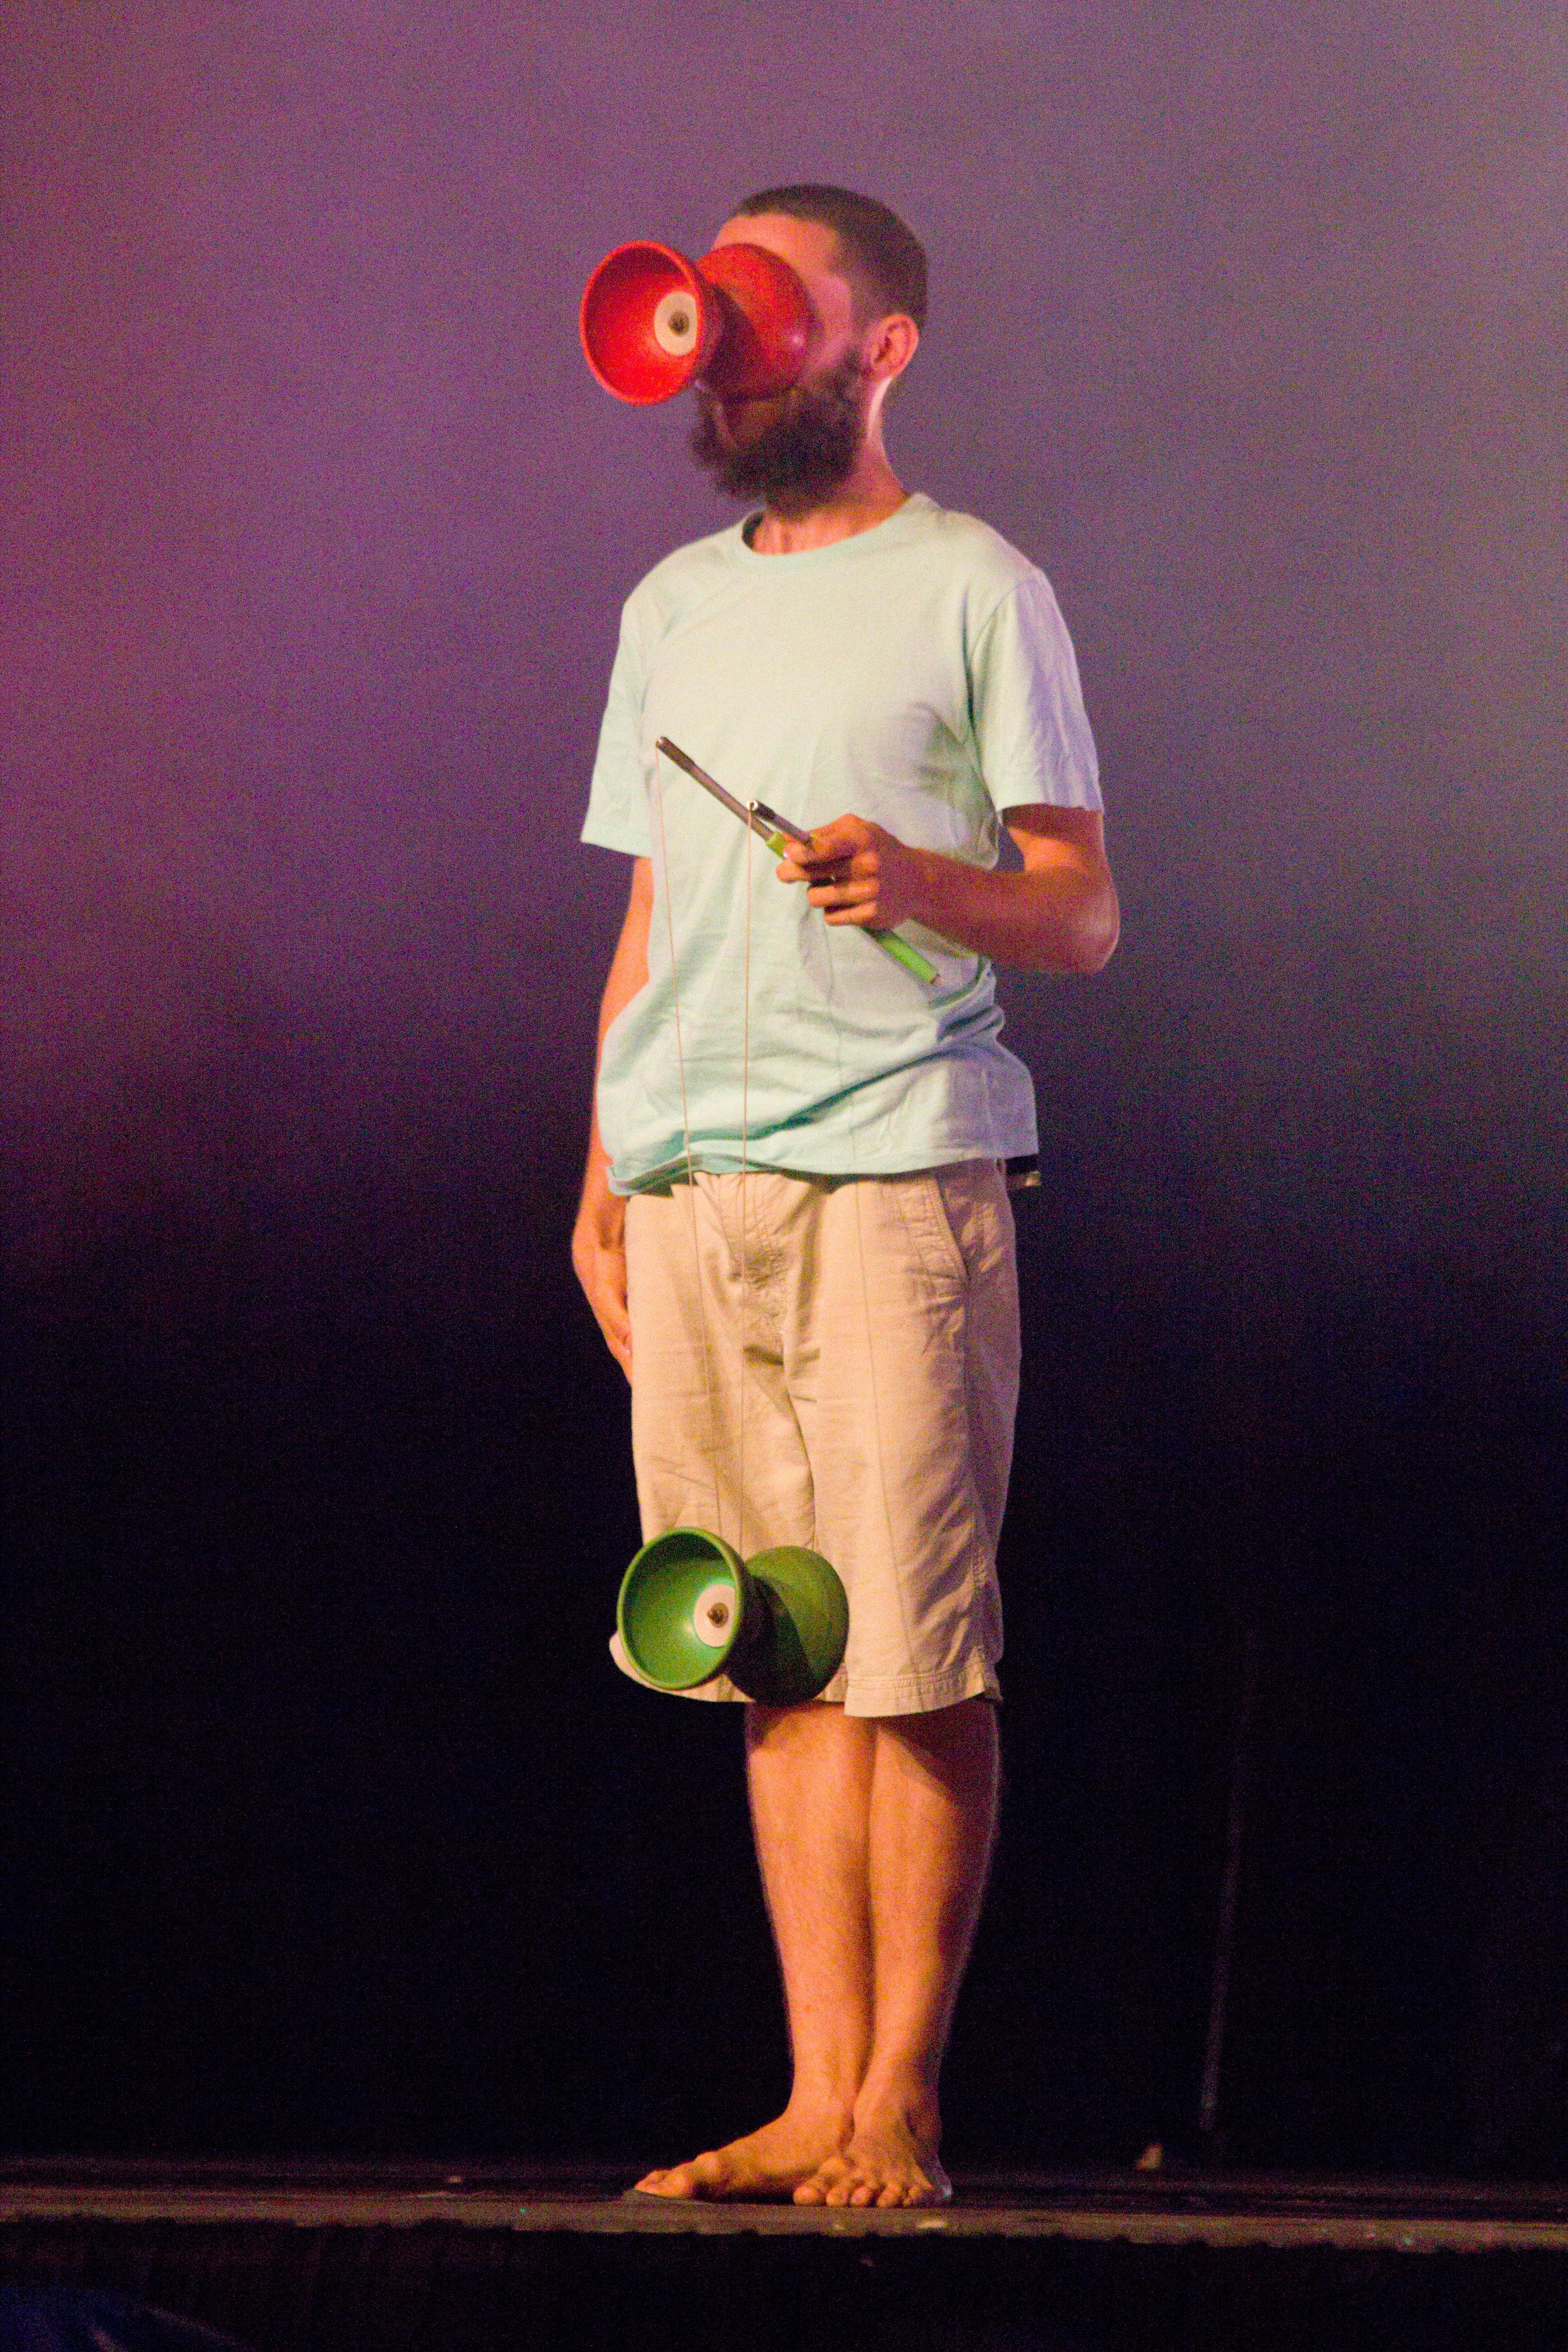 EJC 2014 Millstreet: Open Stage on Wednesday 23rd July.